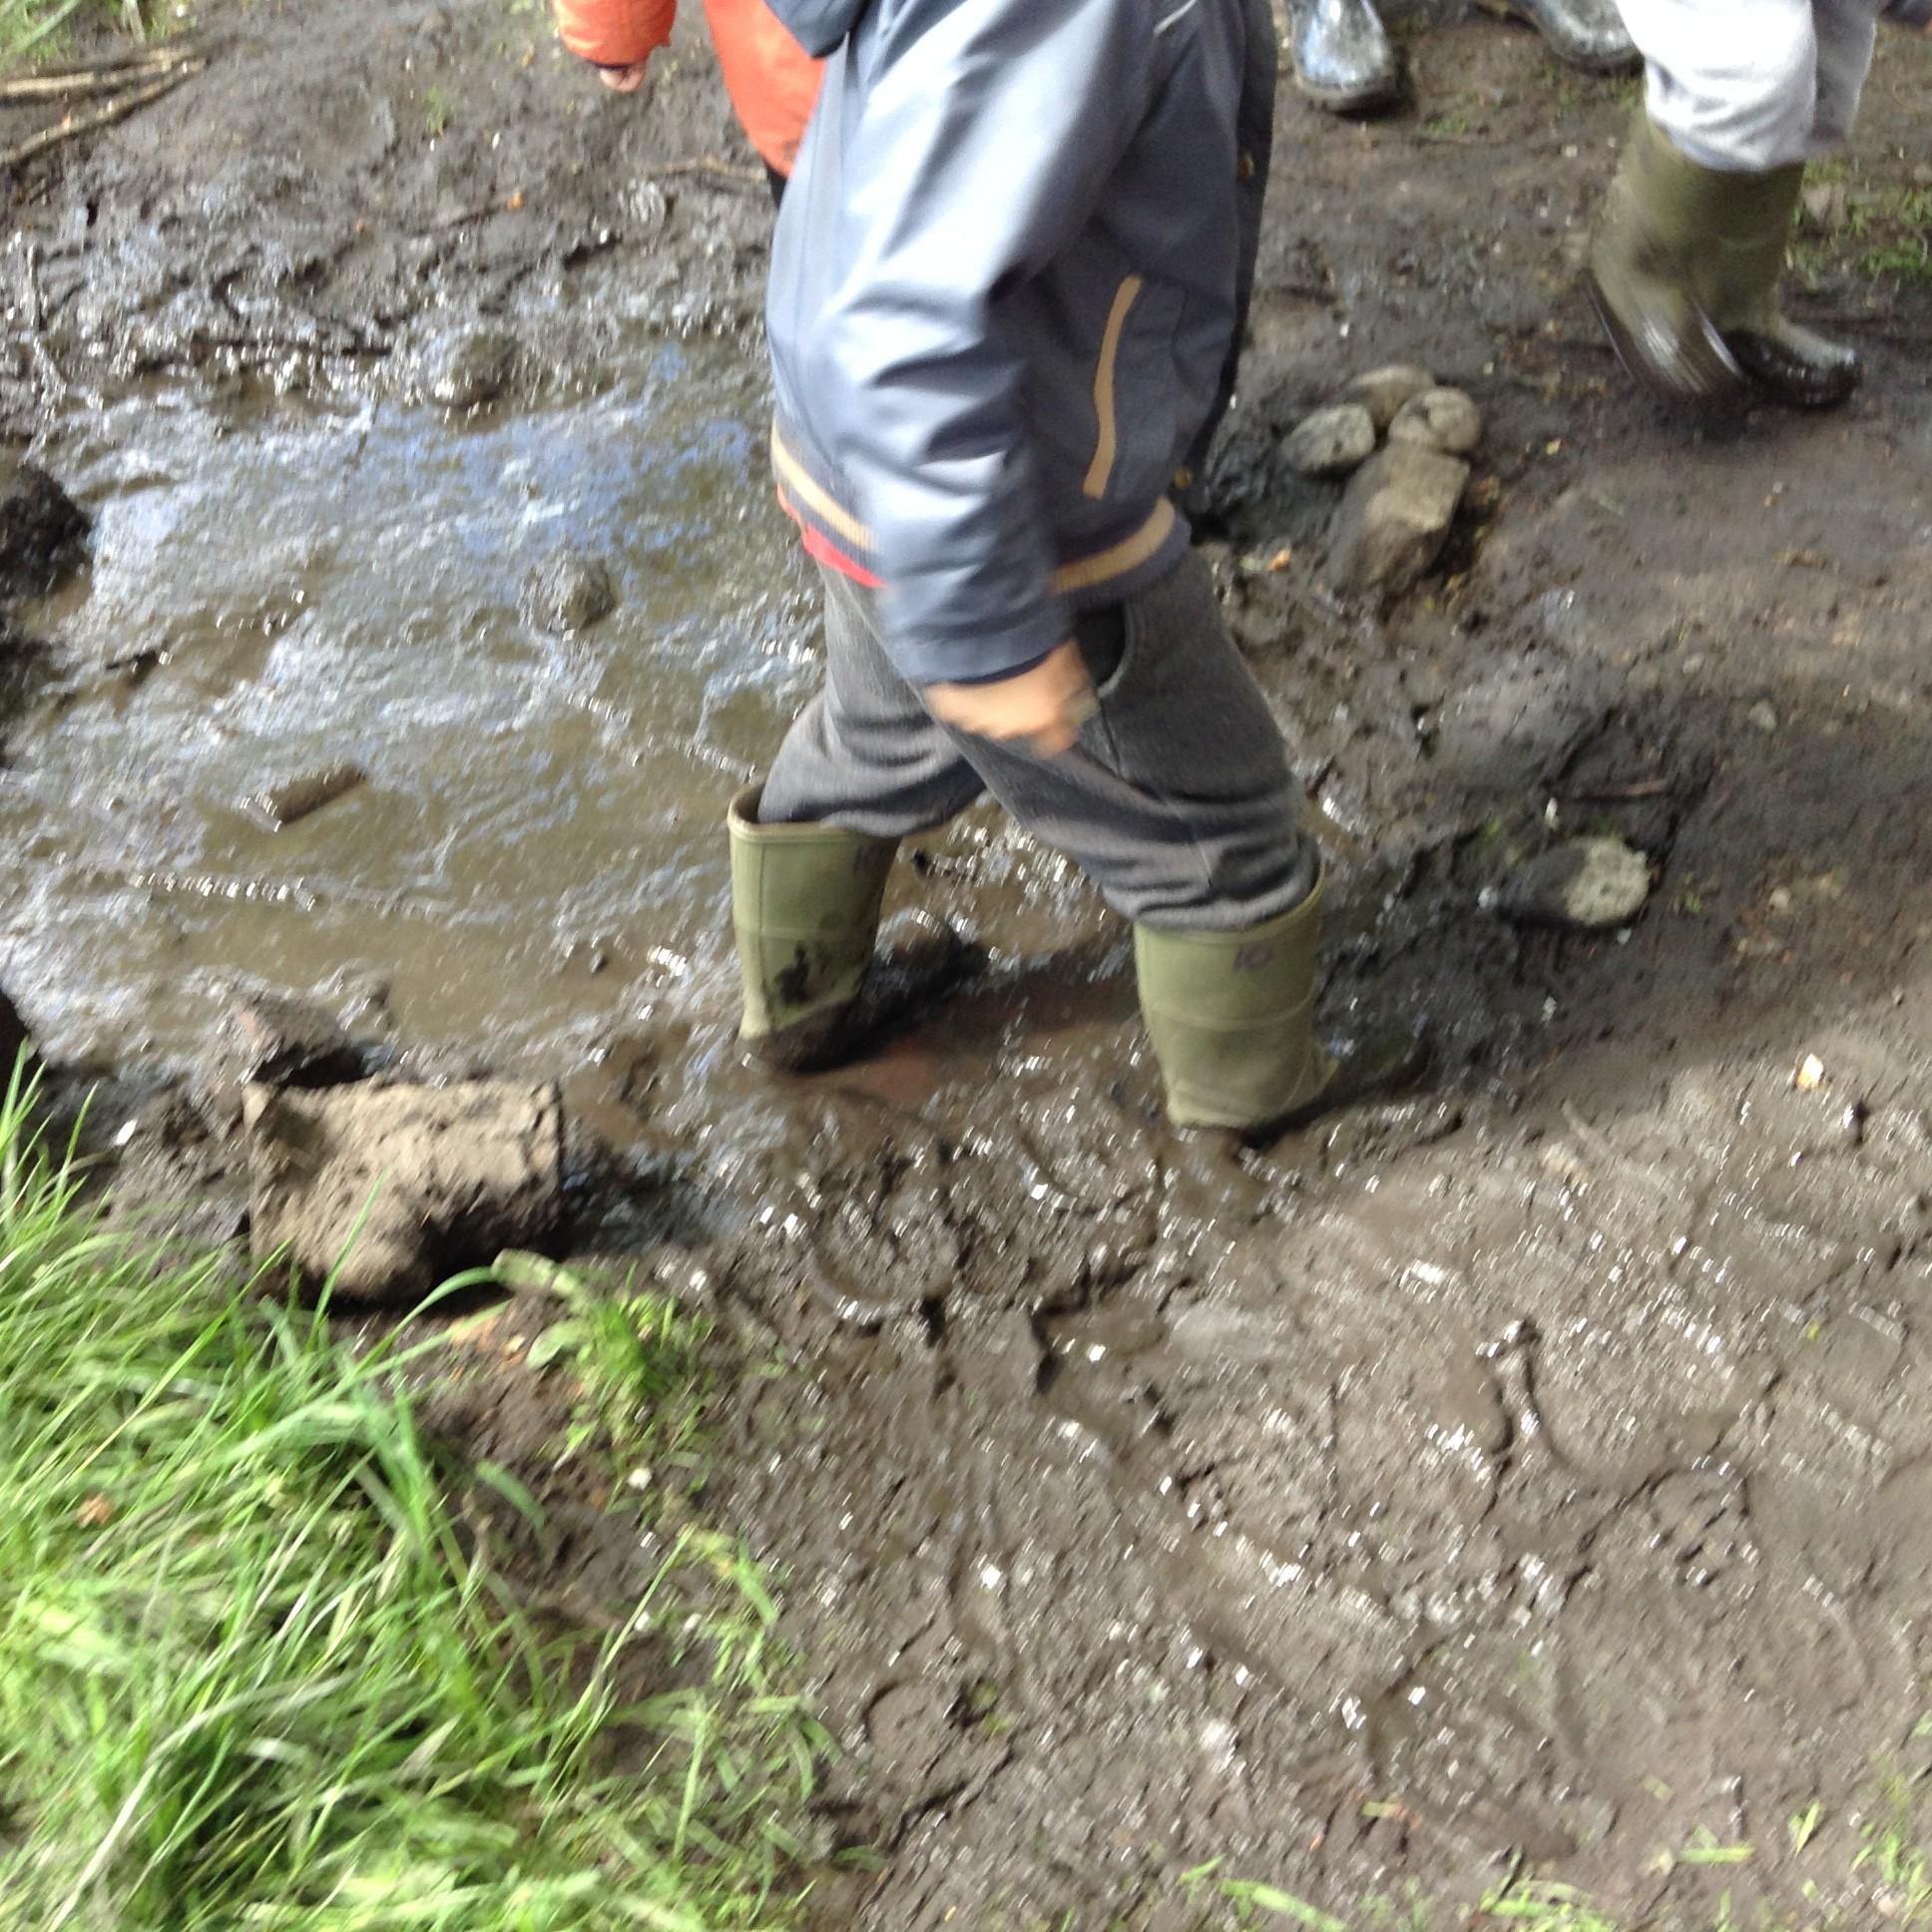 Thick Oozy Mud!